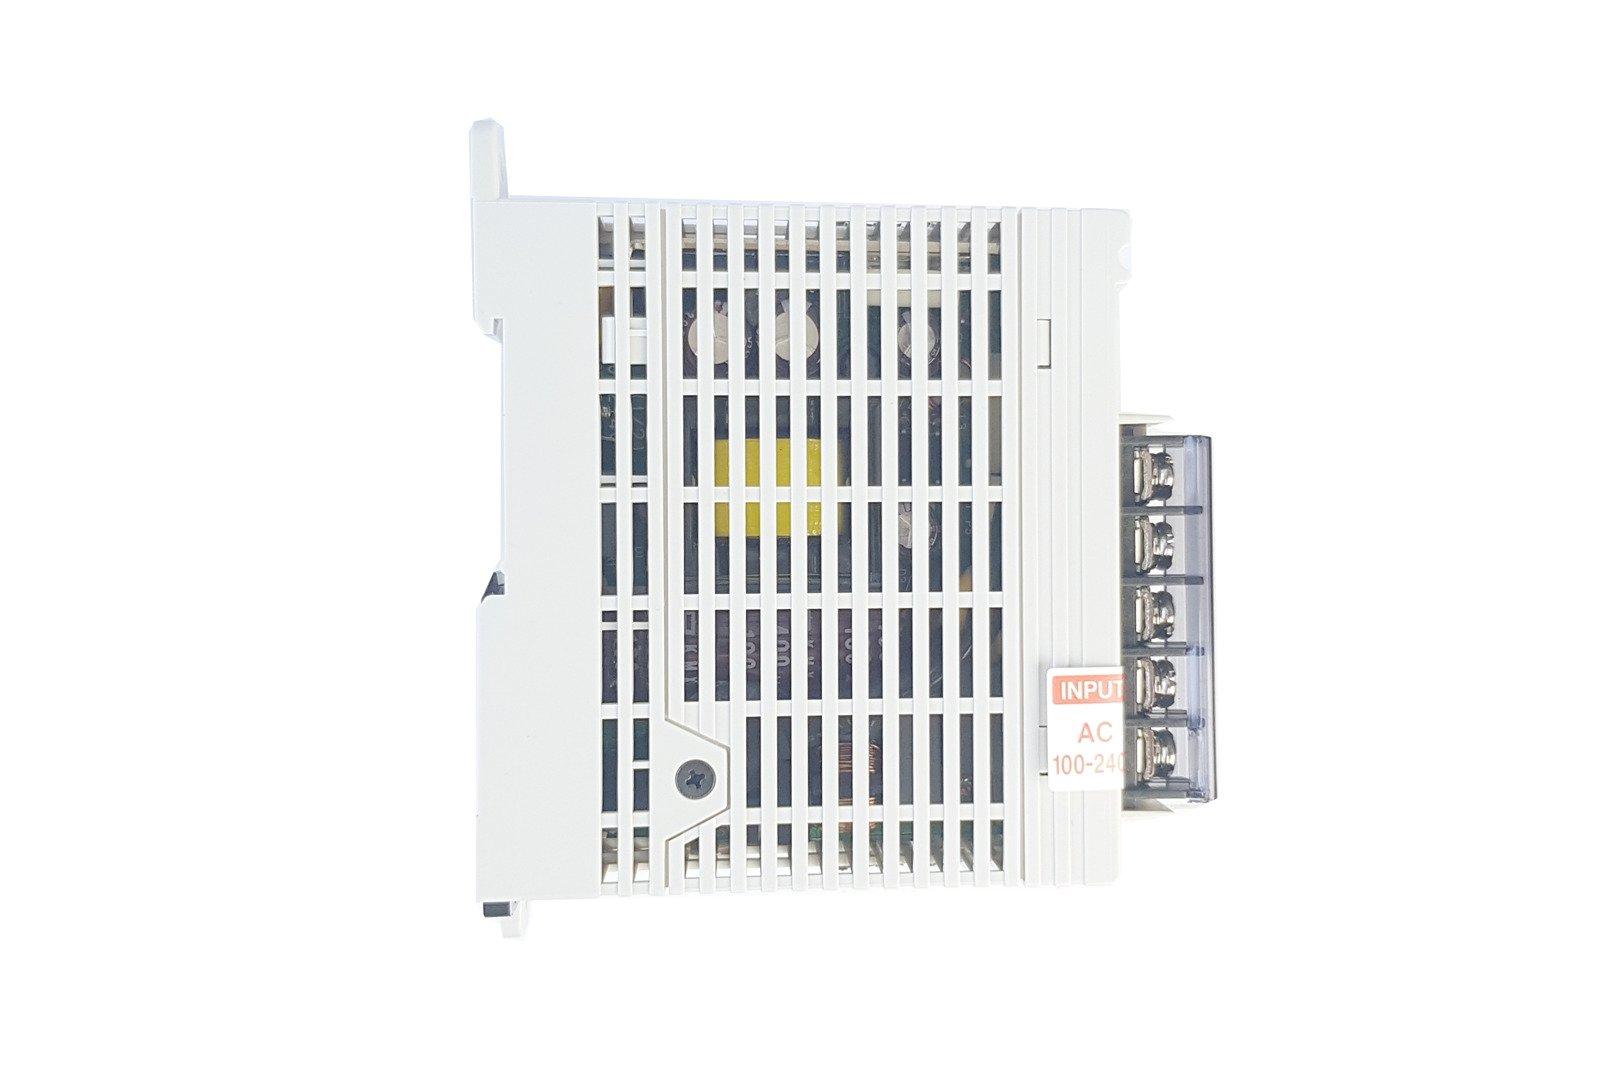 Keyence Power Supply Unit SL-U2